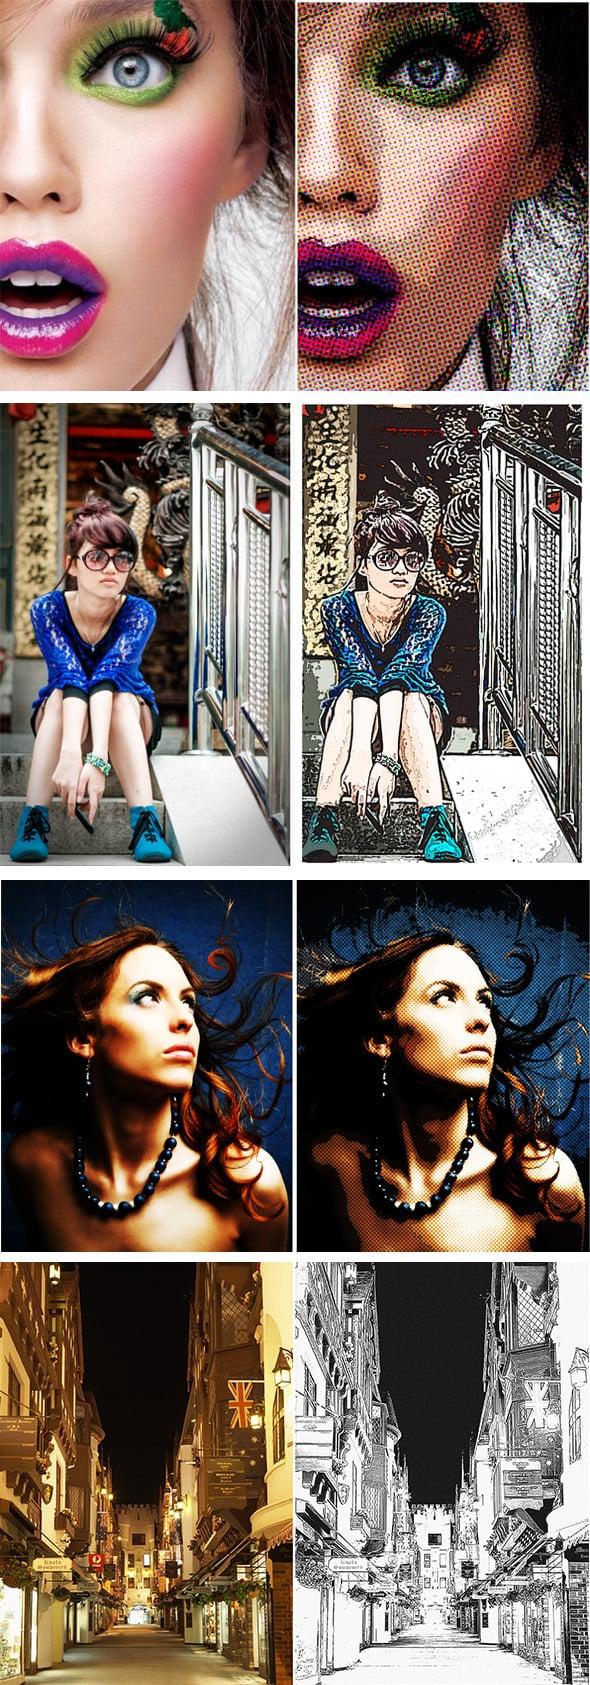 63 VSCO Photoshop Actions: Artistic Actions Bundle - just $9 - 17